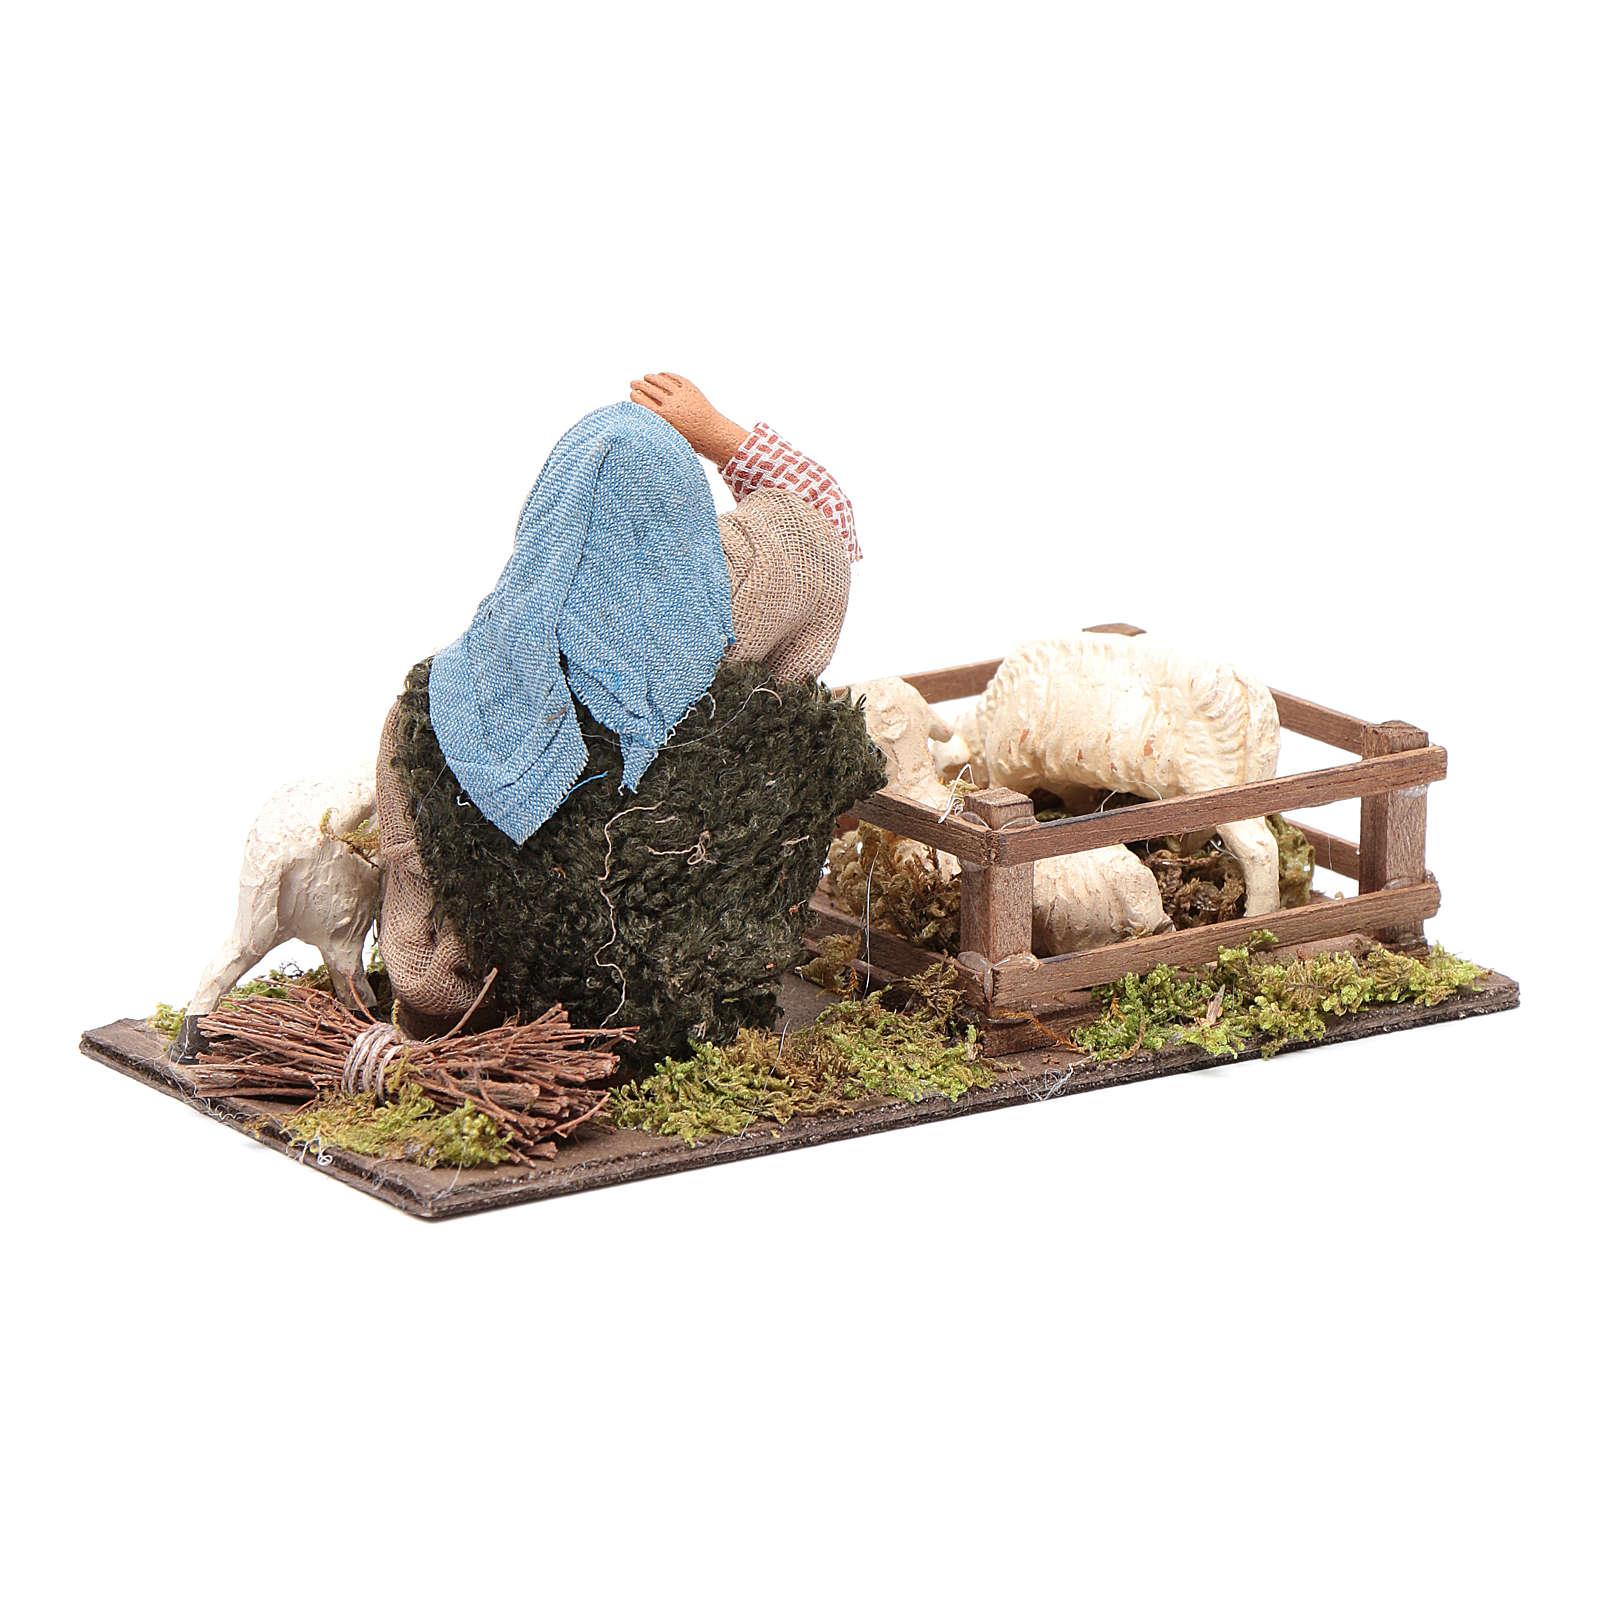 Shepherd with sheep cote 10cm, Neapolitan Nativity figurine 4